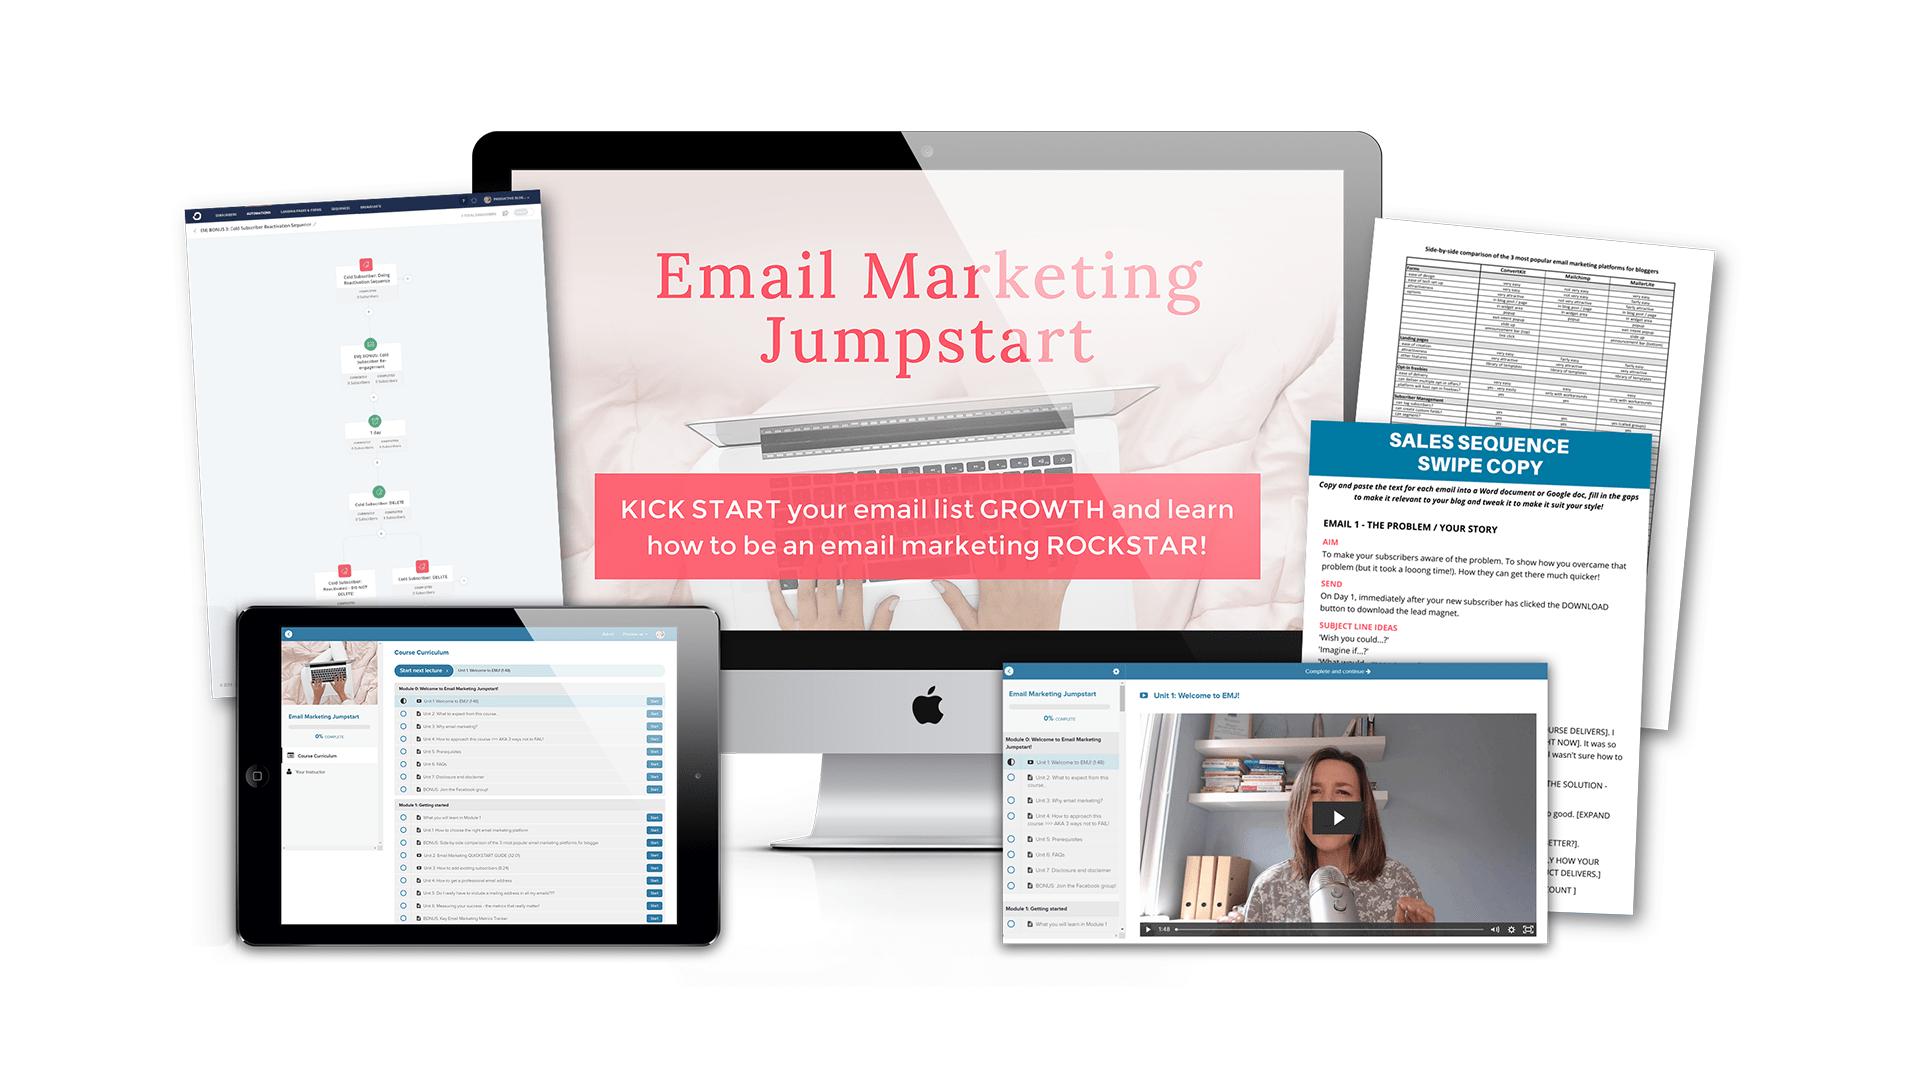 Email Marketing Jumpstart Course